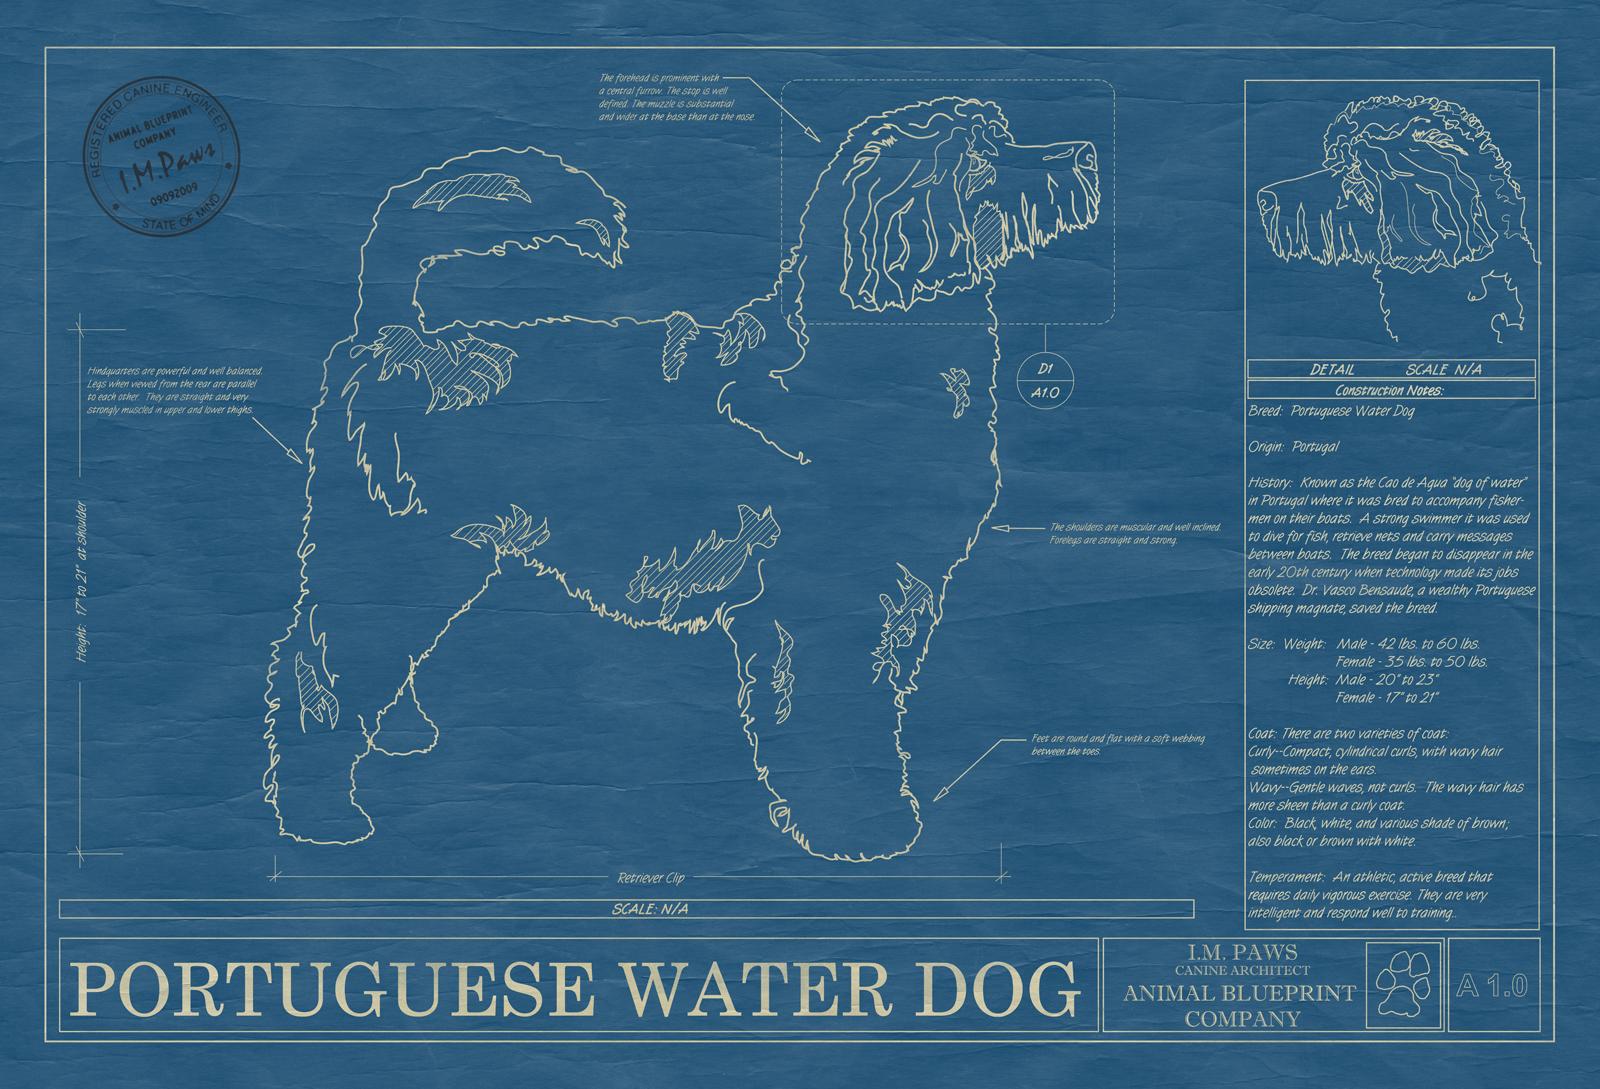 Portuguese water dog animal blueprint company portugese water dog blueprint malvernweather Gallery